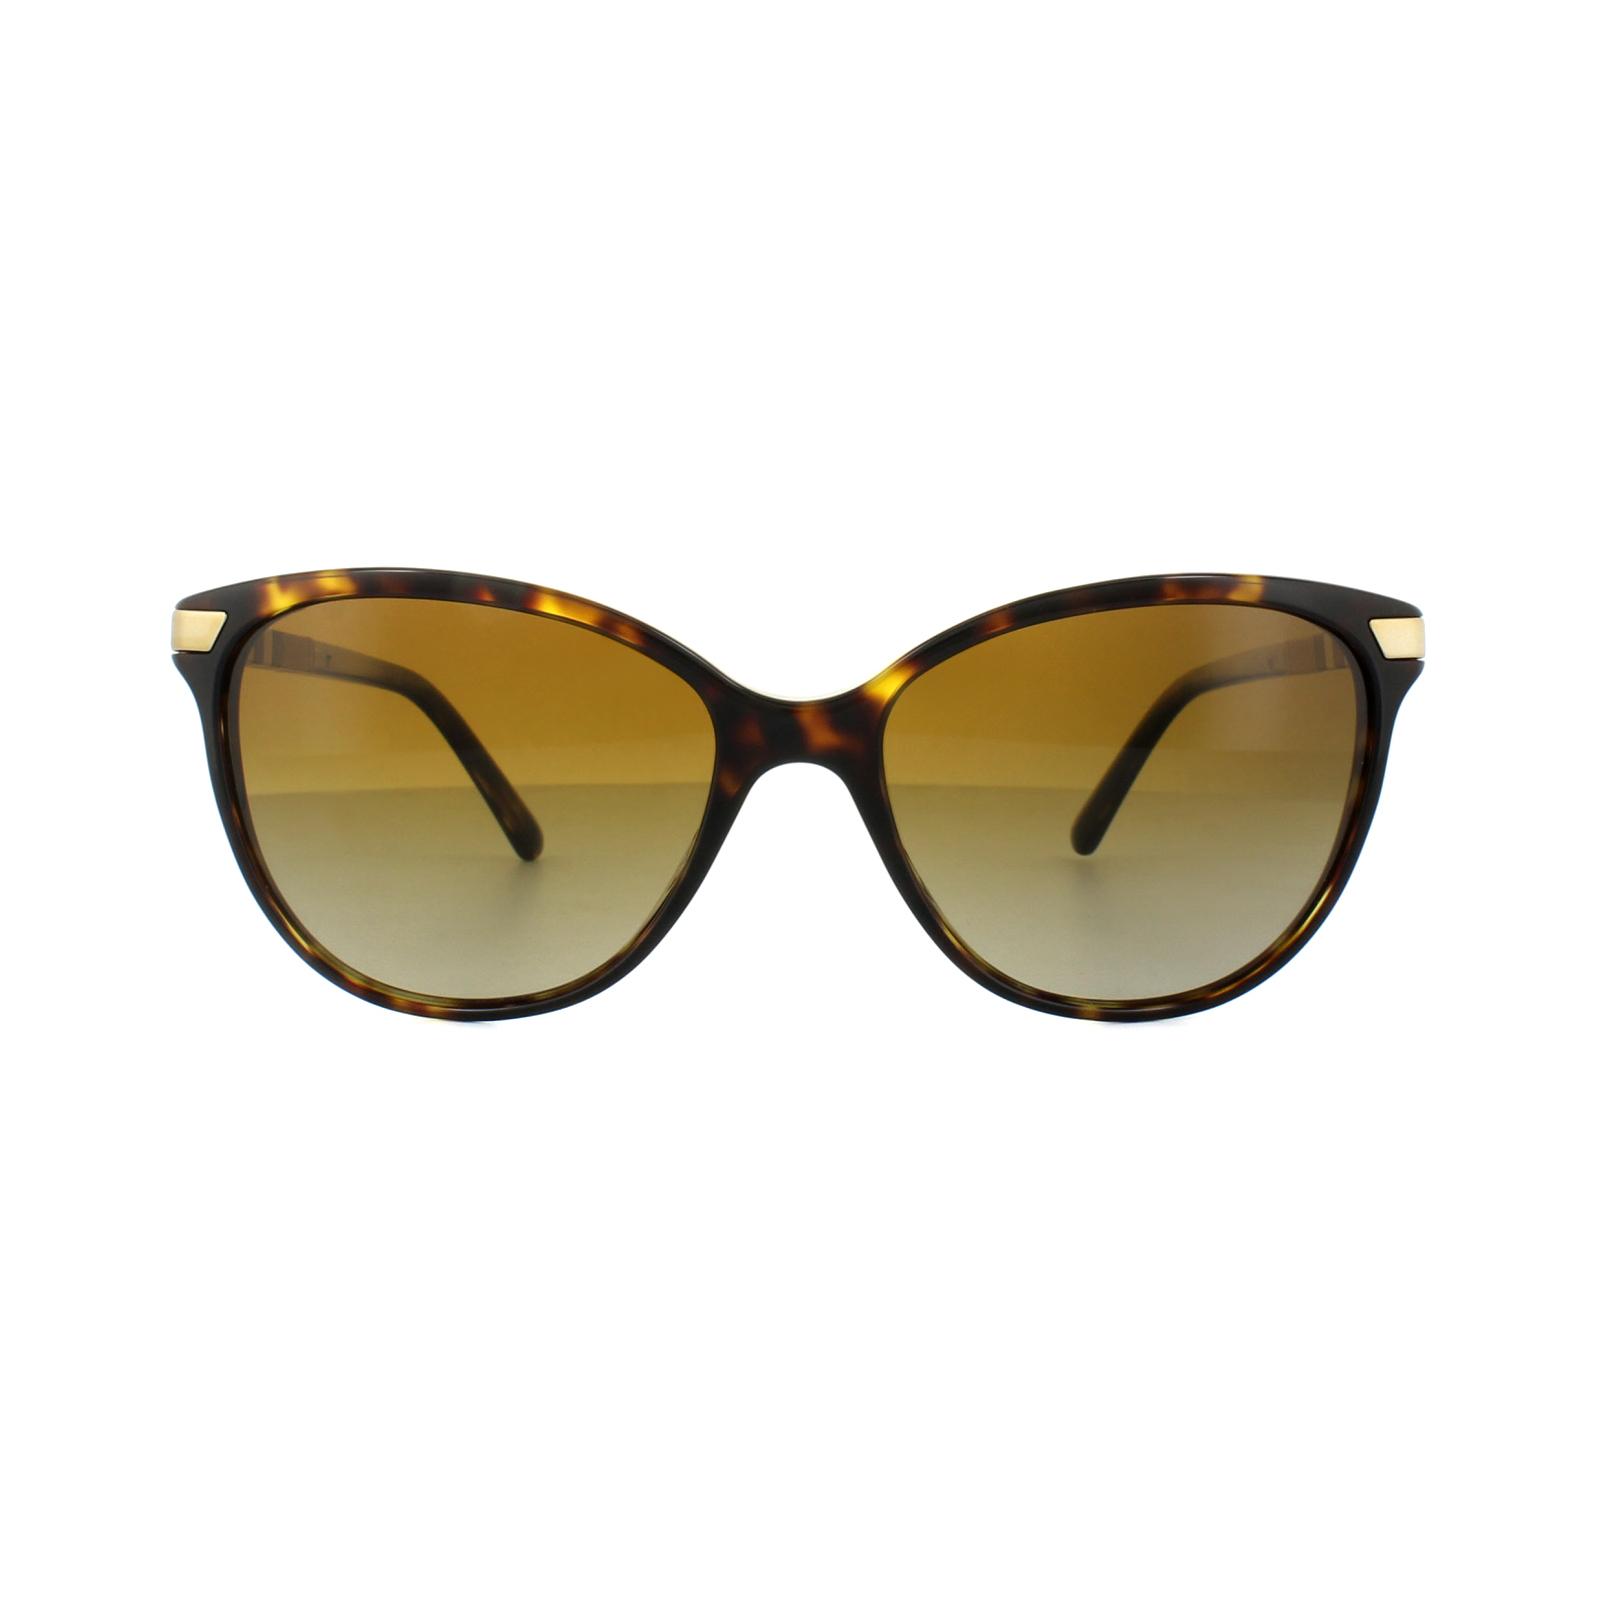 a9df8e47527a Burberry 4216 Sunglasses Thumbnail 1 Burberry 4216 Sunglasses Thumbnail 2  ...